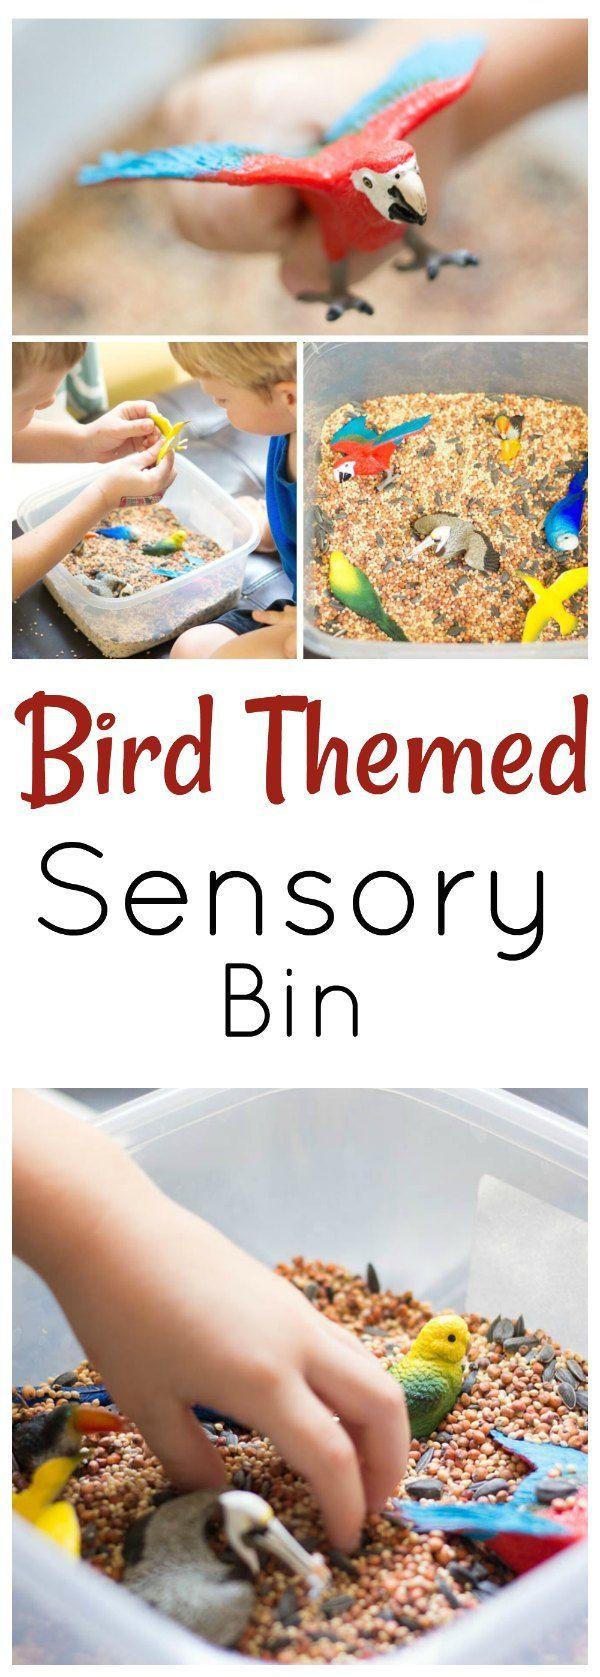 Teach your preschoolers about backyard birds with this sensory bin.